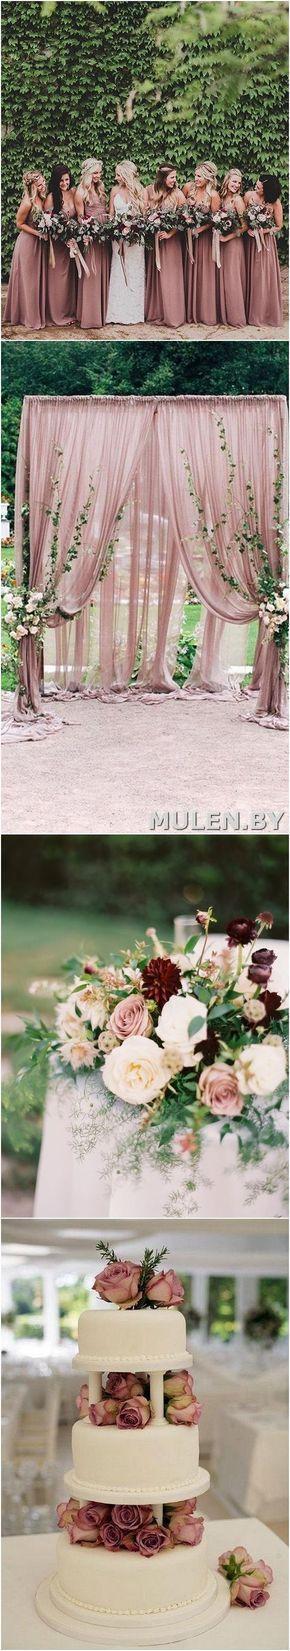 wedding dress hochzeitsideen 15 beste Fotos